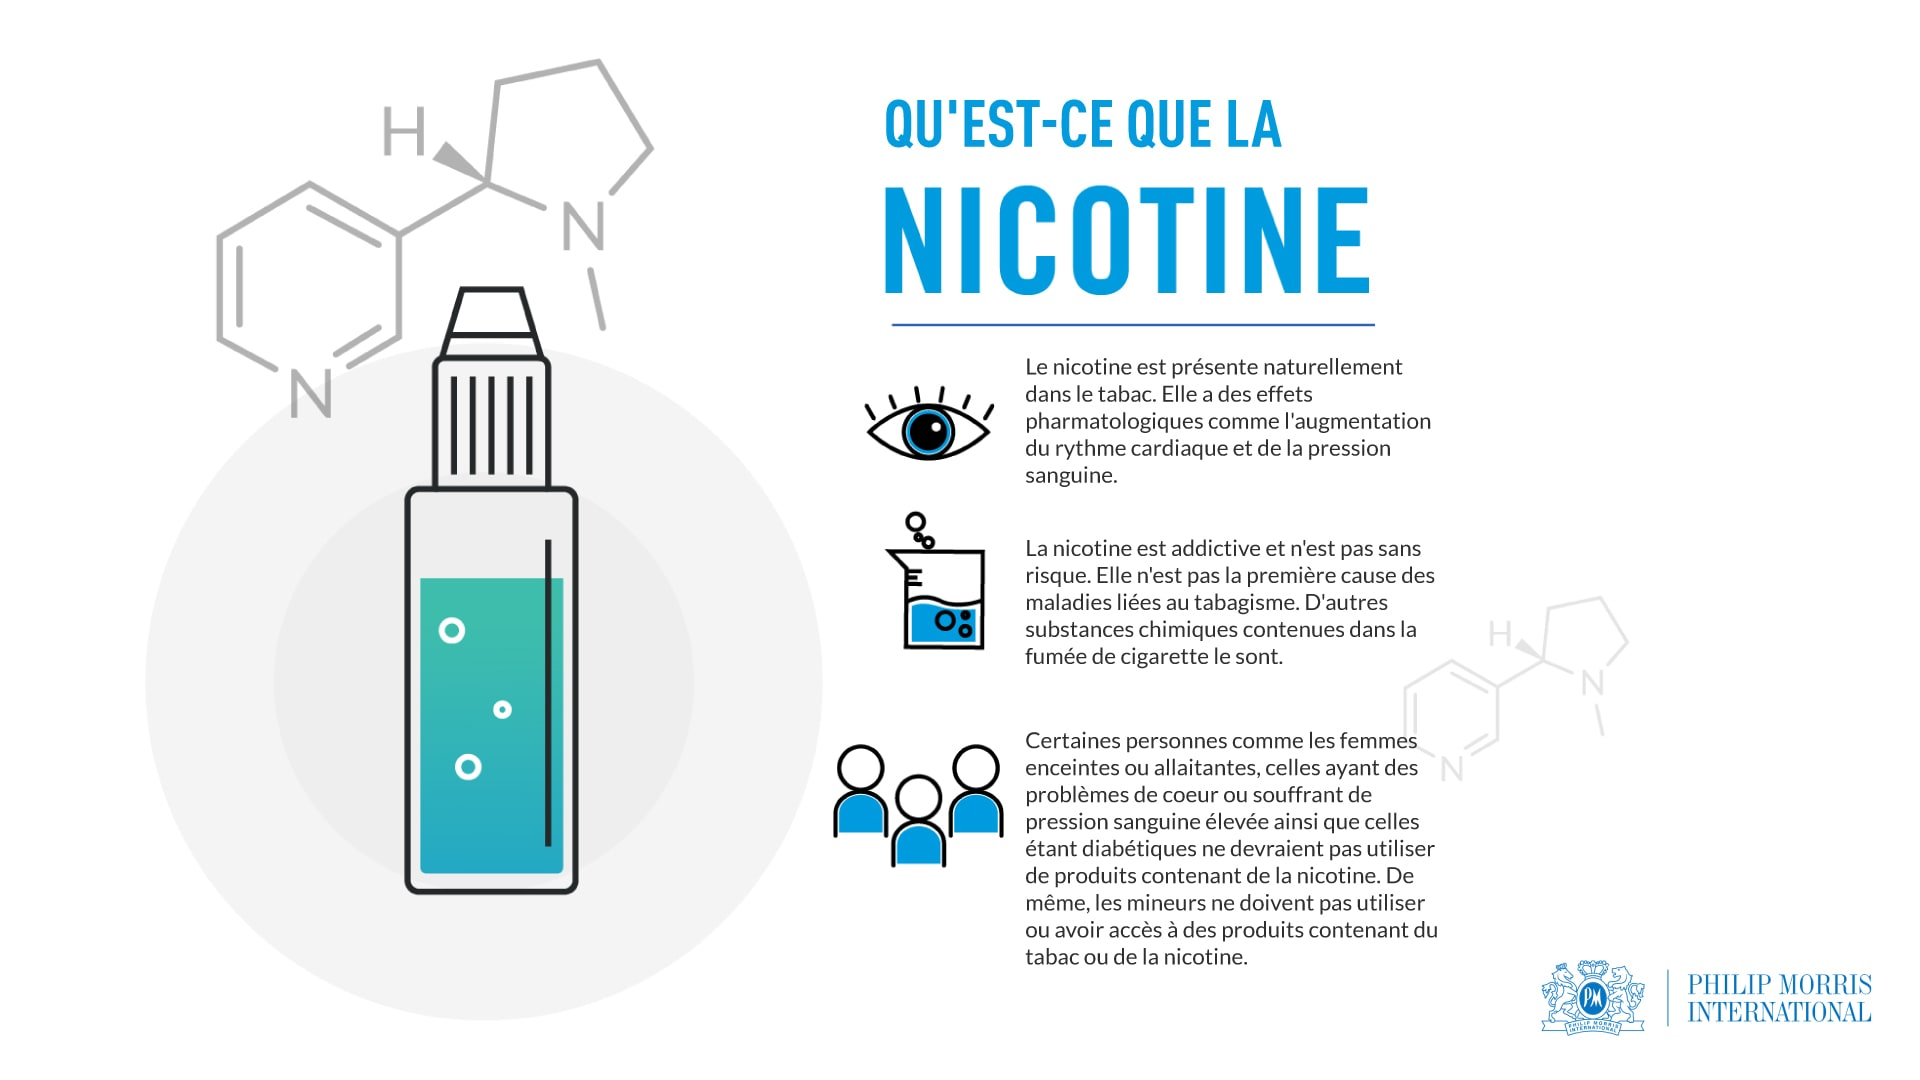 Nicotine infographic